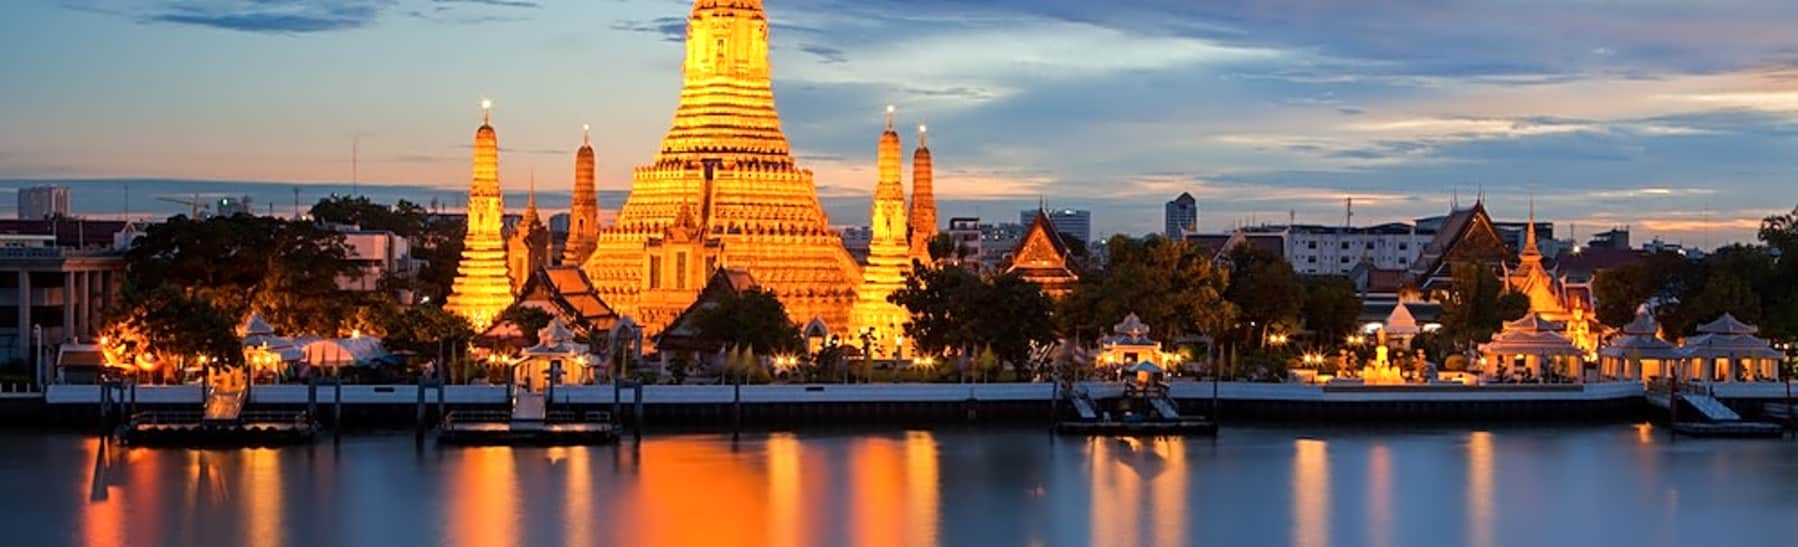 Loy Nava Chao Phraya River Dinner Cruise – Evening gallery